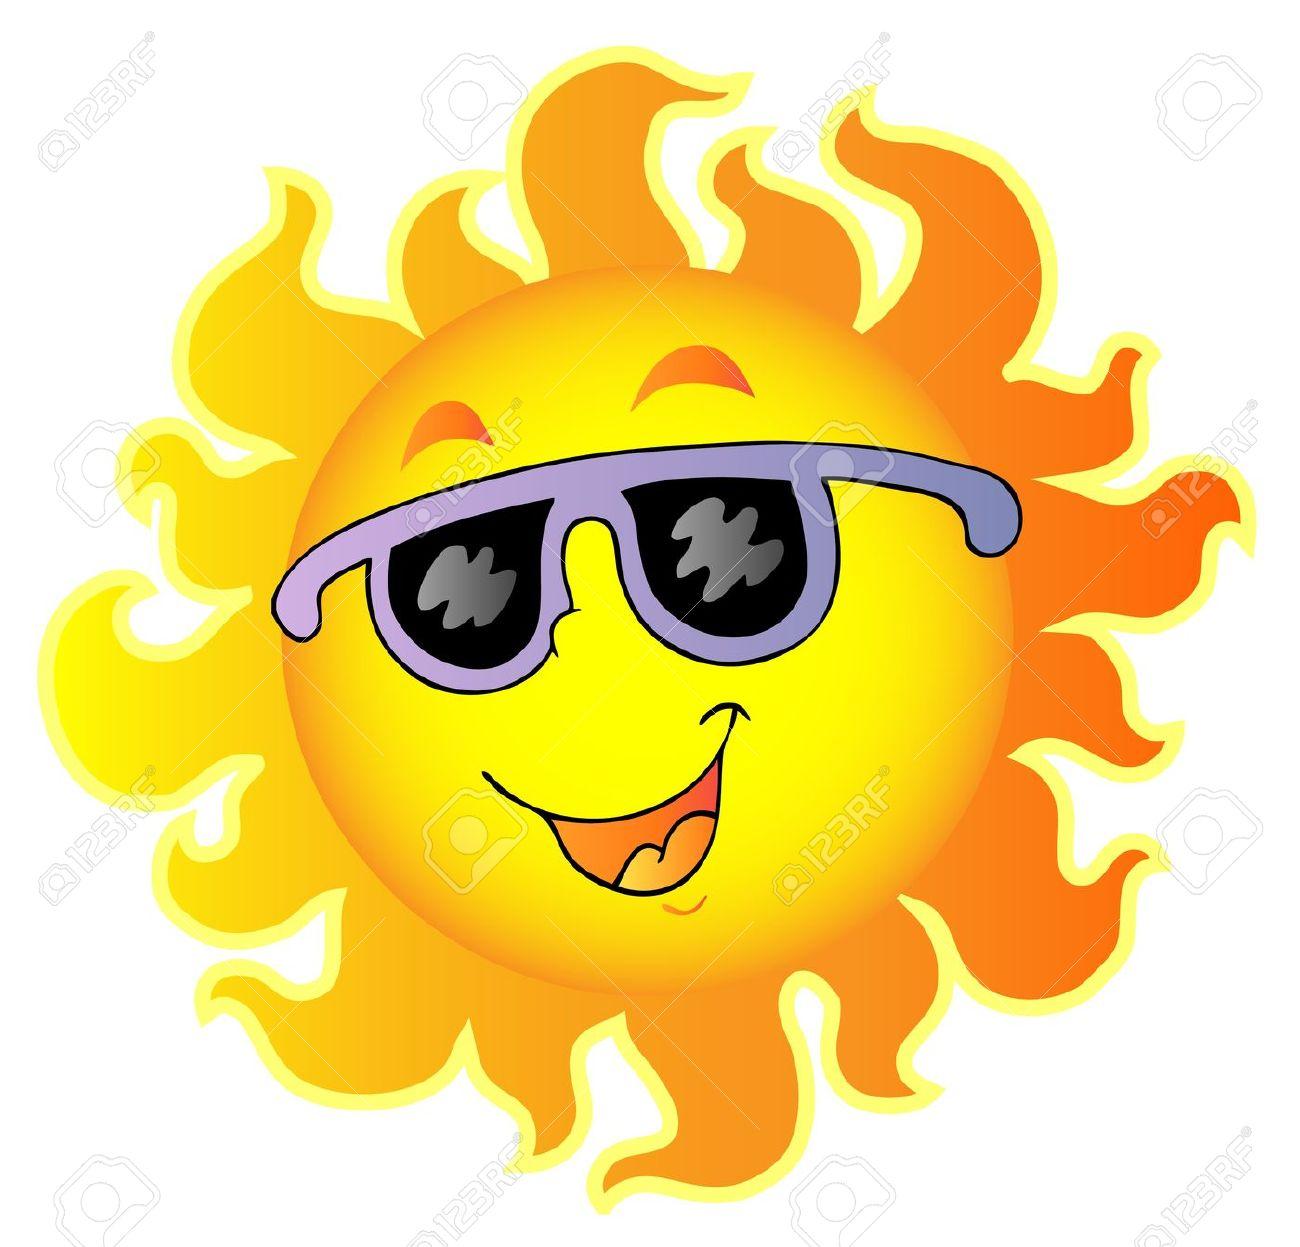 Heat clipart sun and moon Heat Heat Free Clipart Clipart